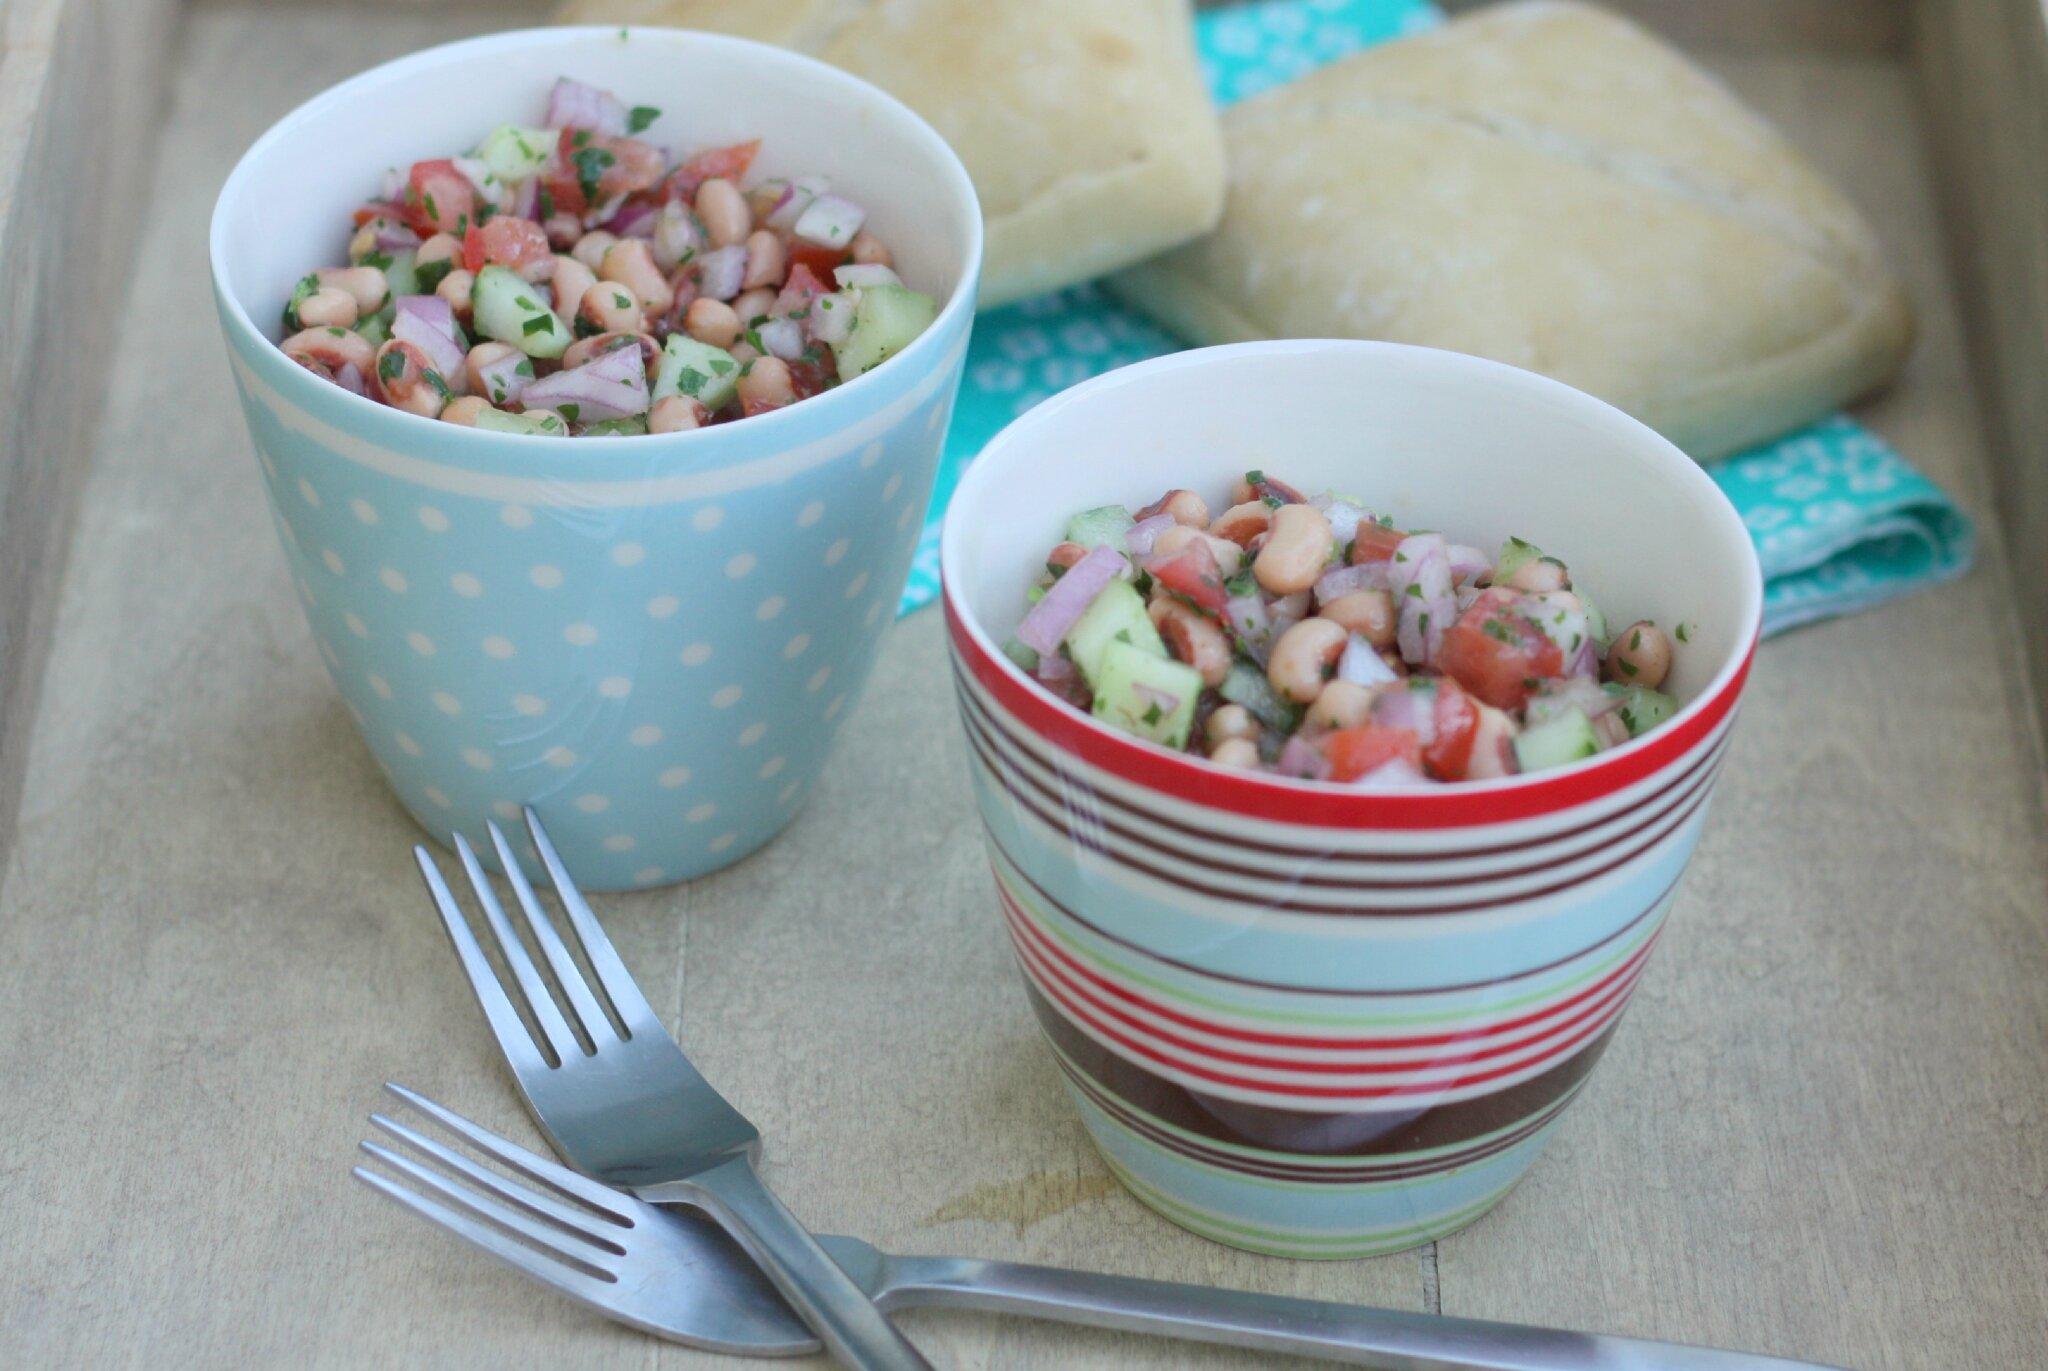 Salade de haricots cornille